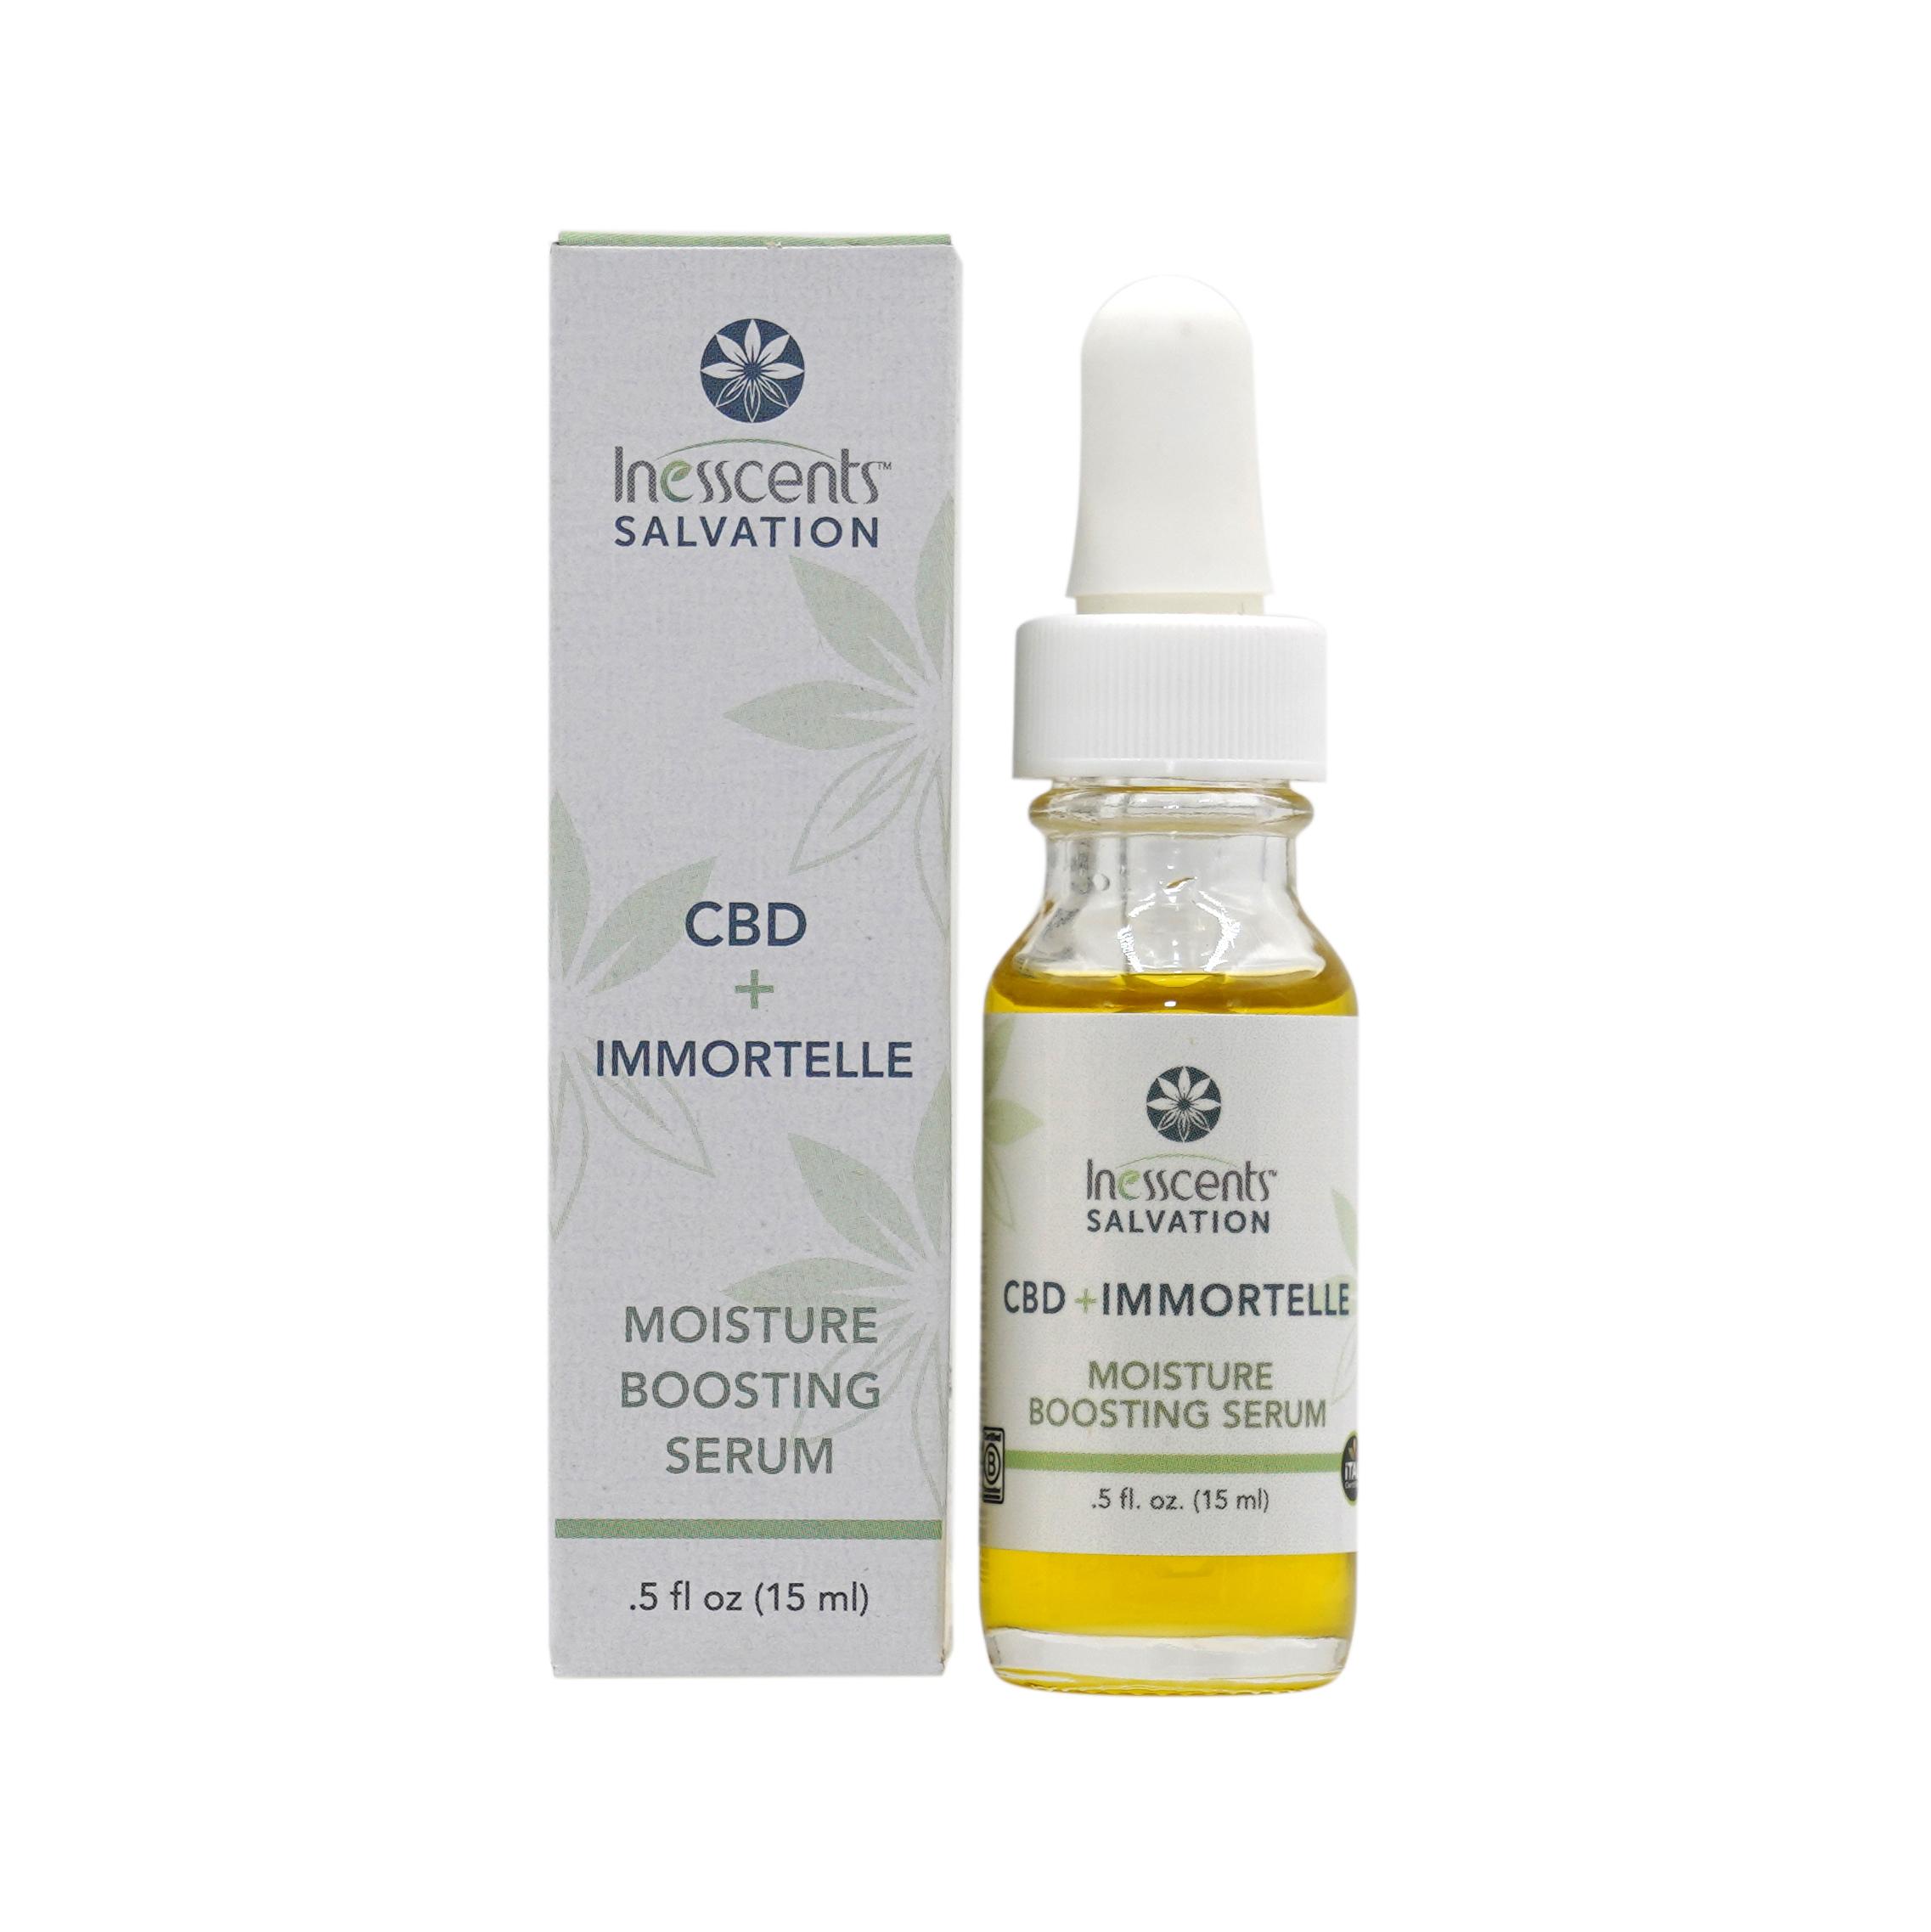 beauty-cbd-immortelle-serum.jpg